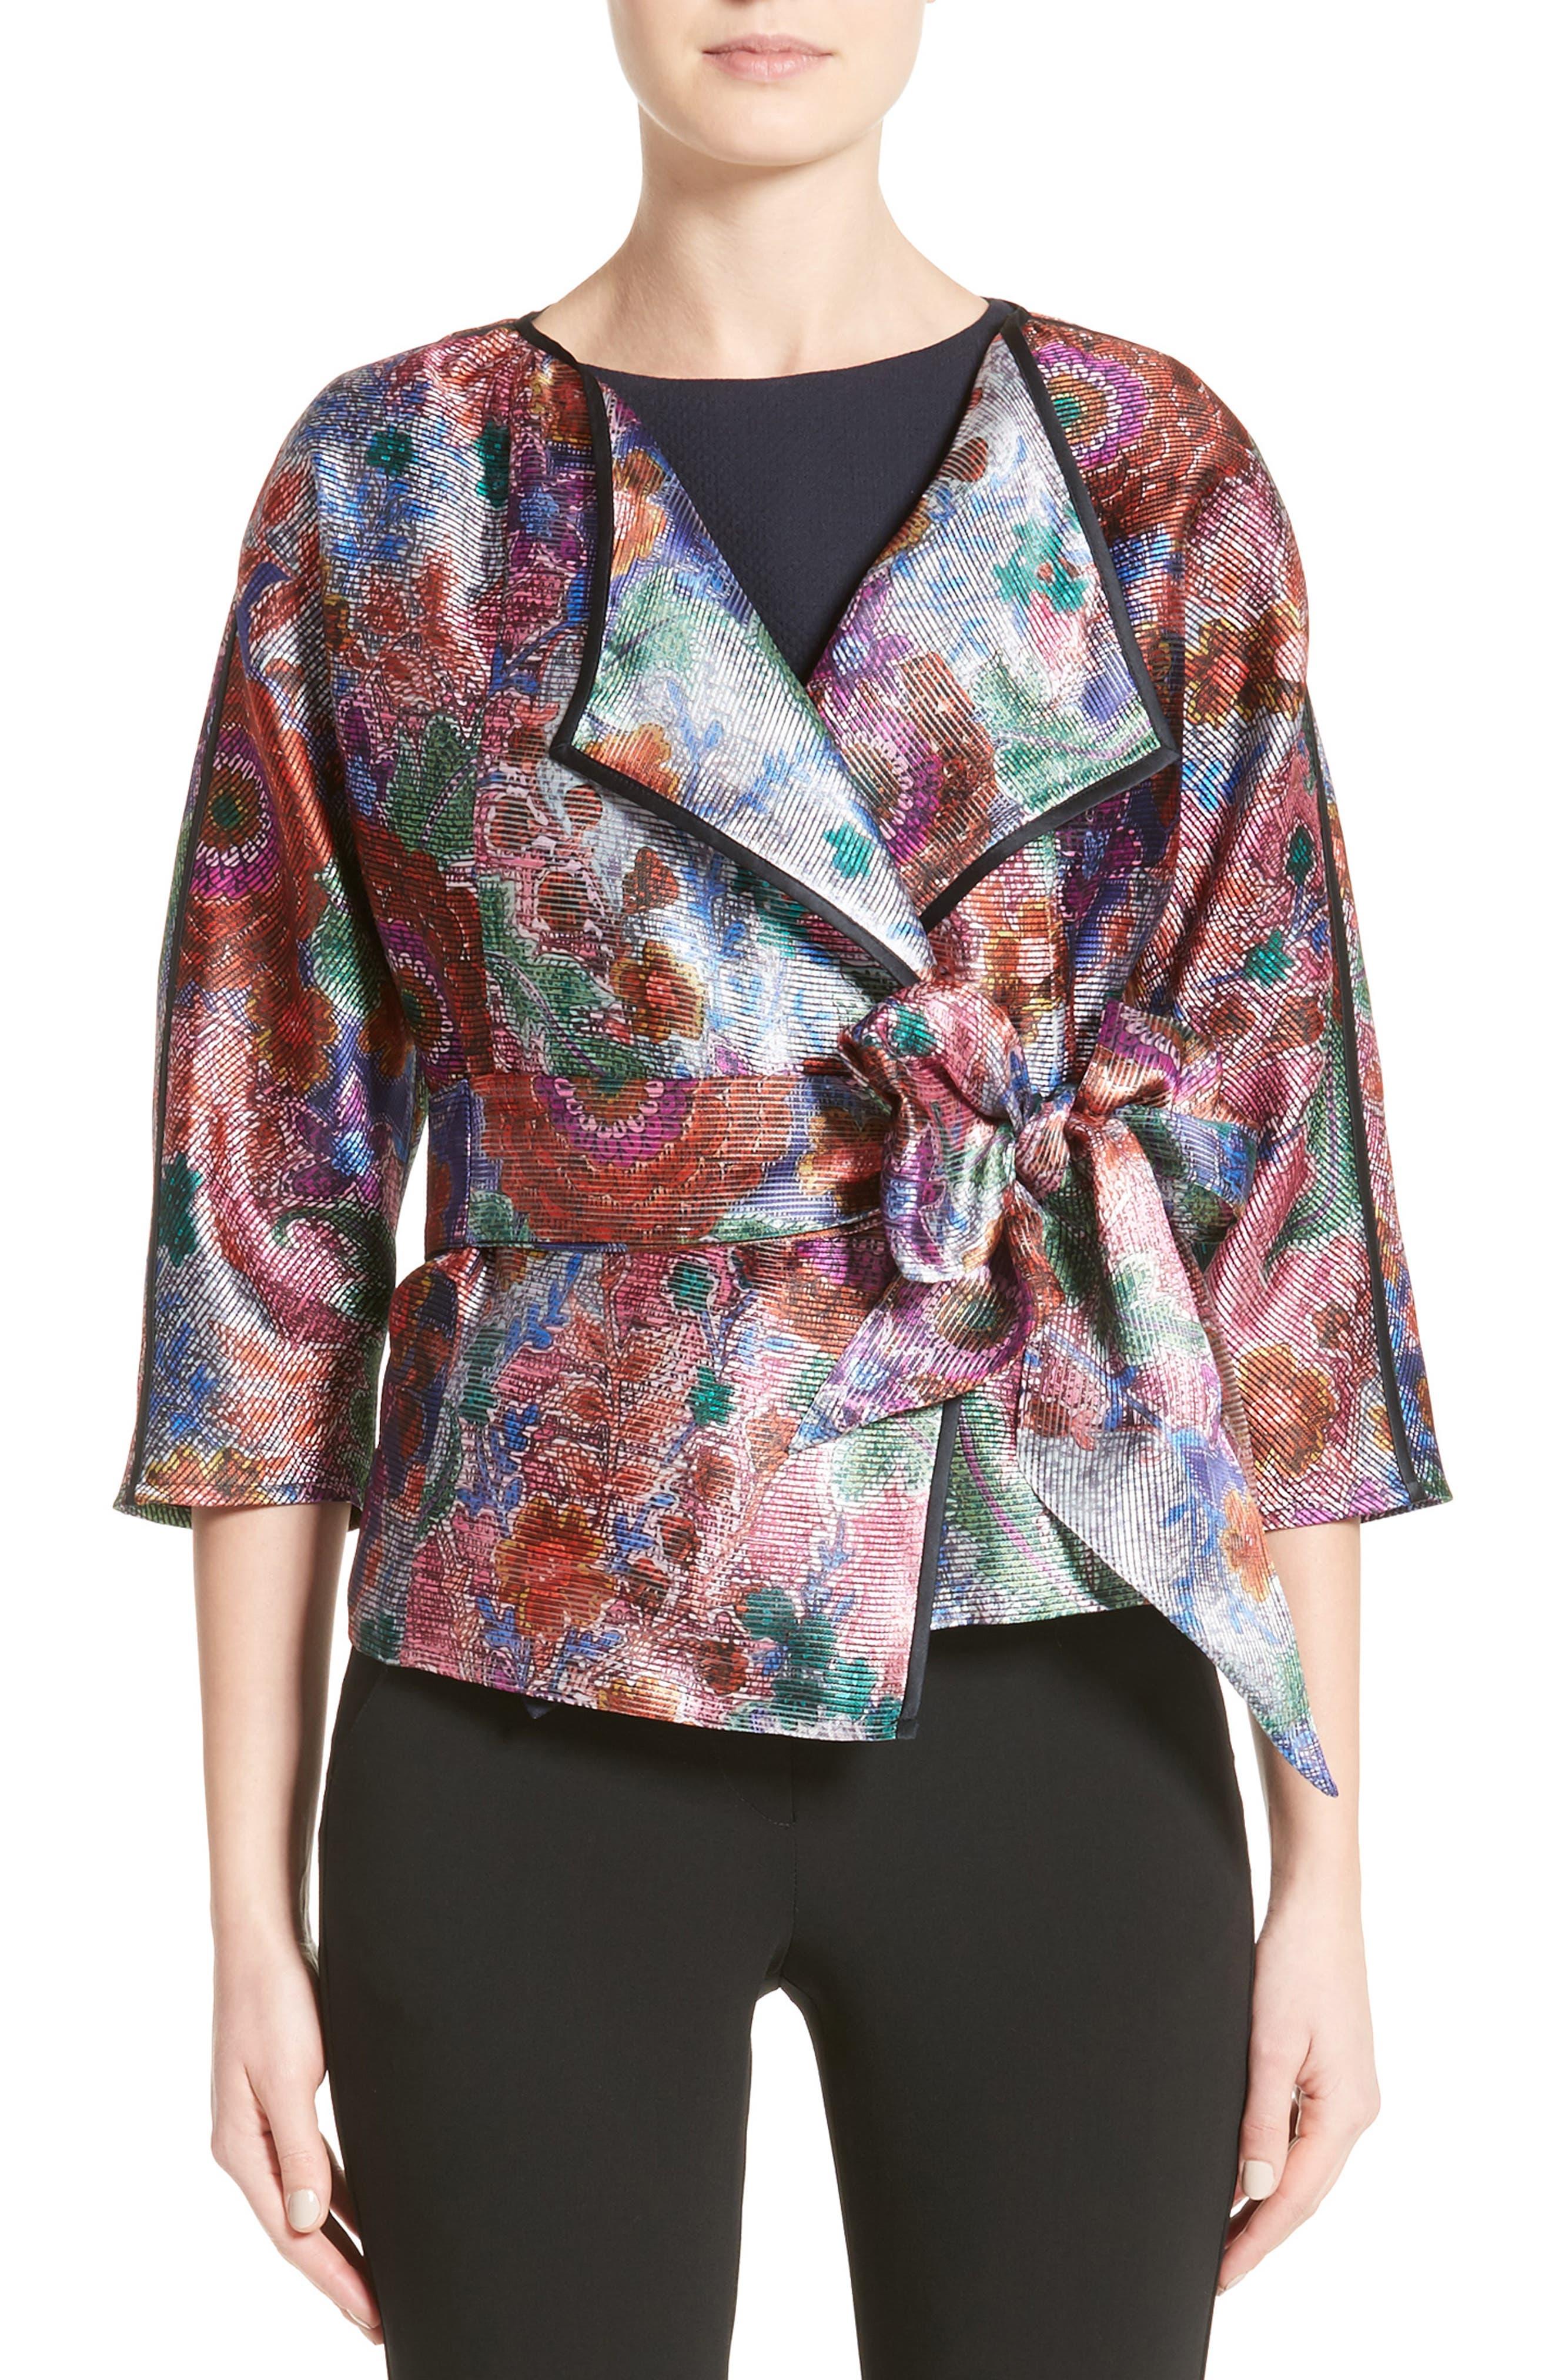 Main Image - Armani Collezioni Floral Print Organza Jacket